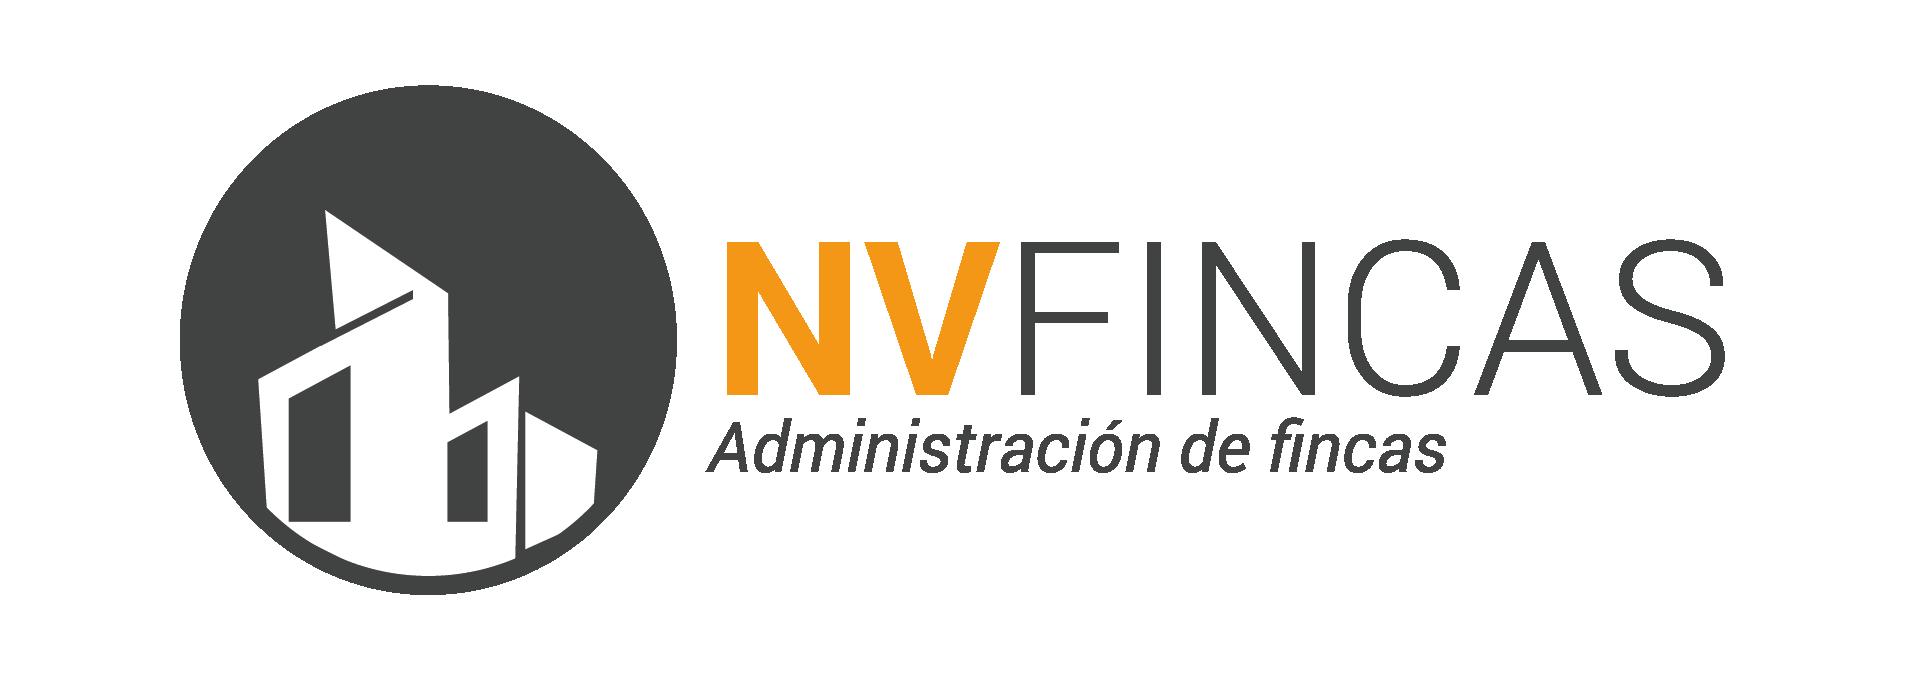 NVfincas